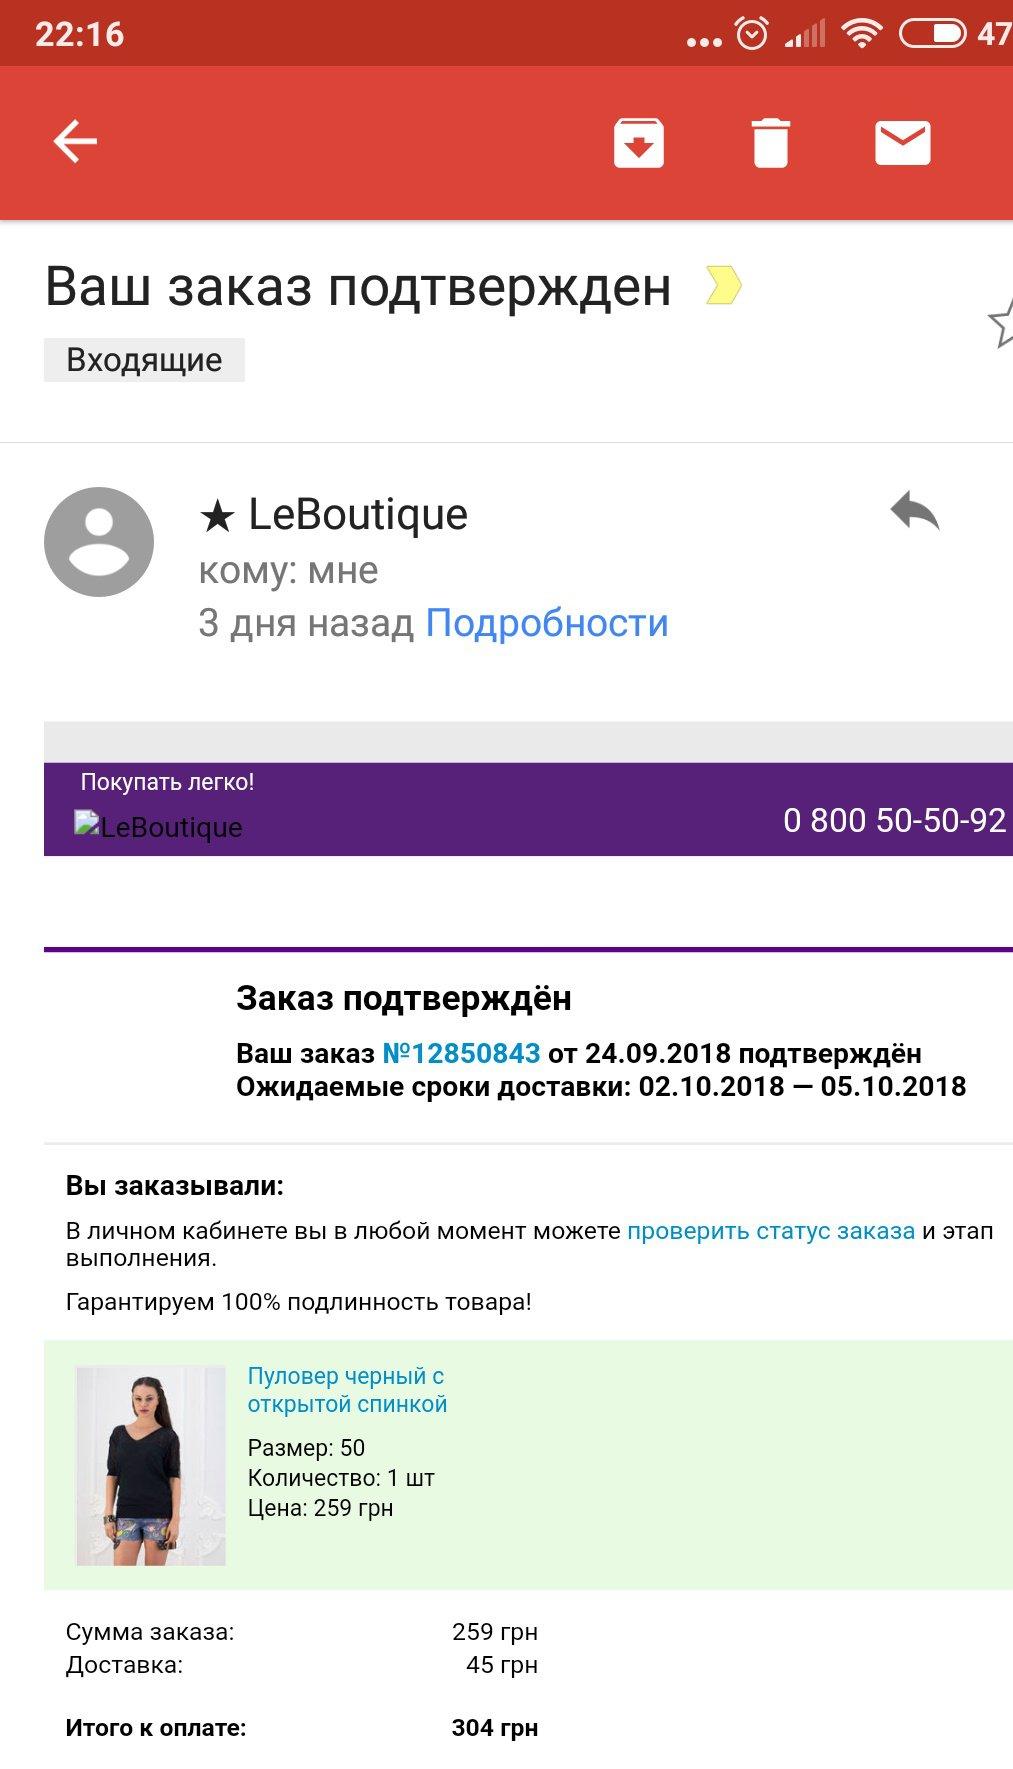 Лебутик интернет магазин киев отзывы